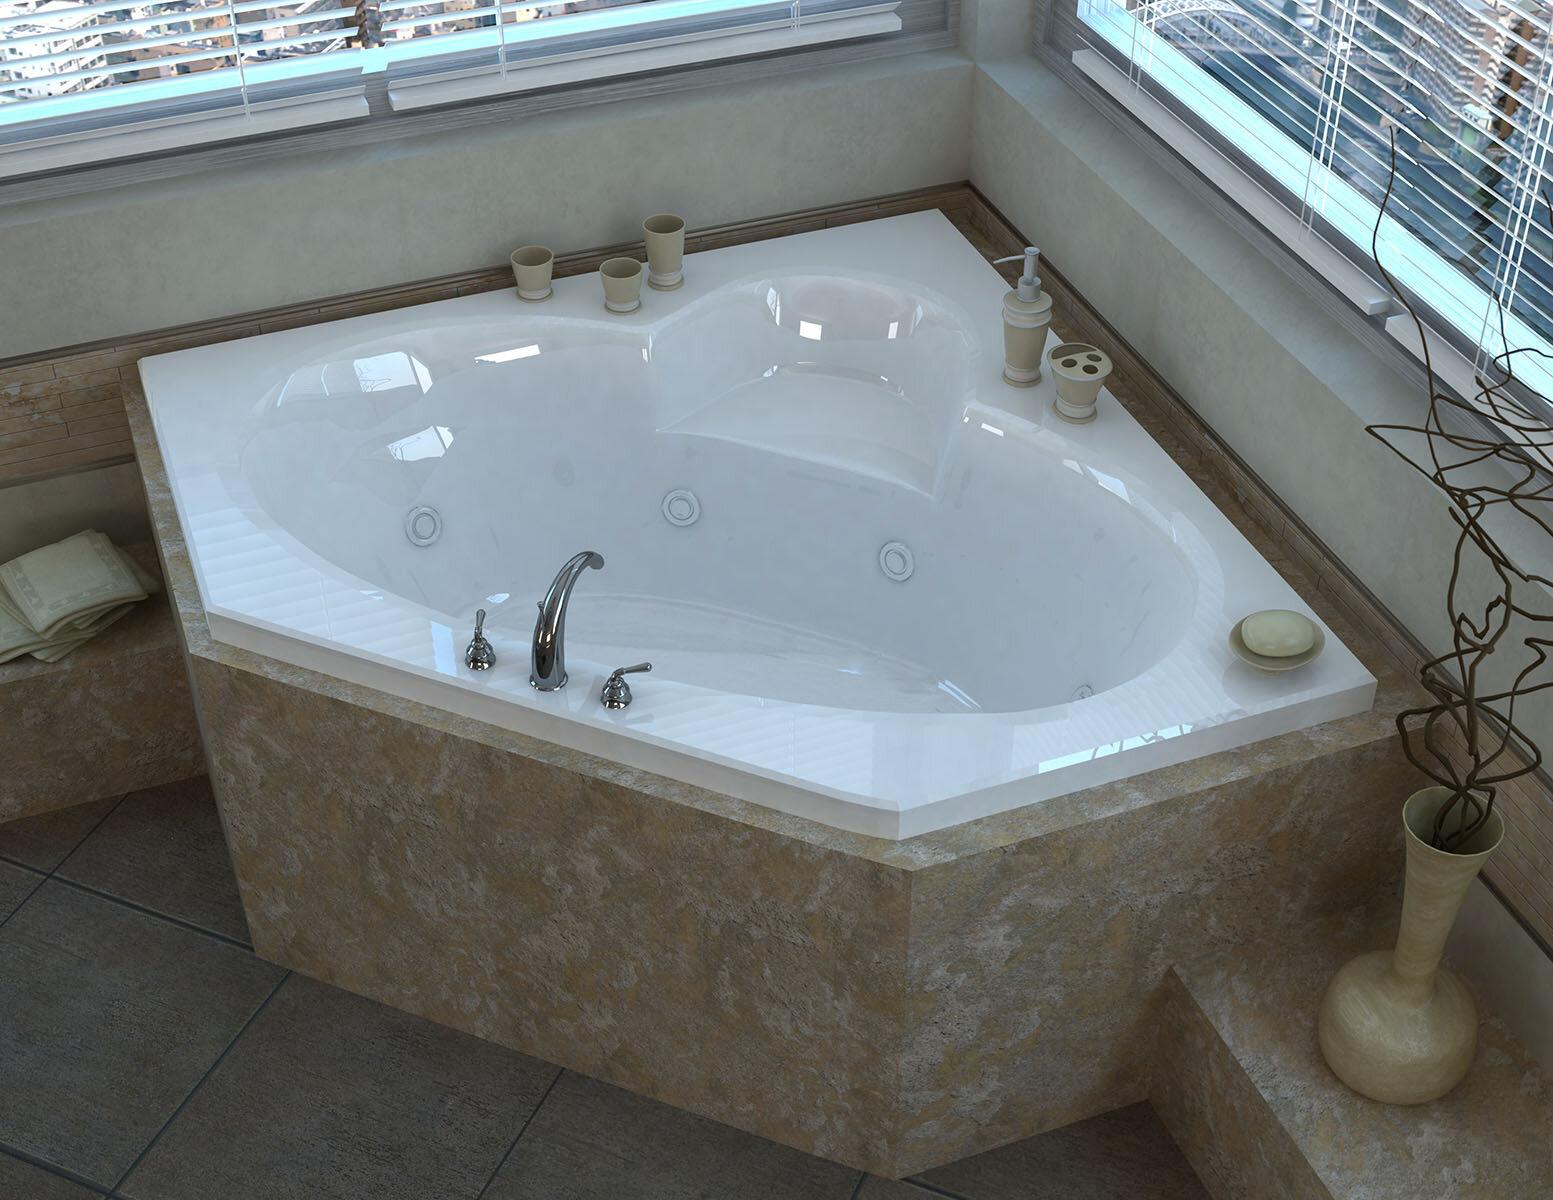 Amazing Bathtub Drain Shoe Collection - Bathtub Ideas - dilata.info